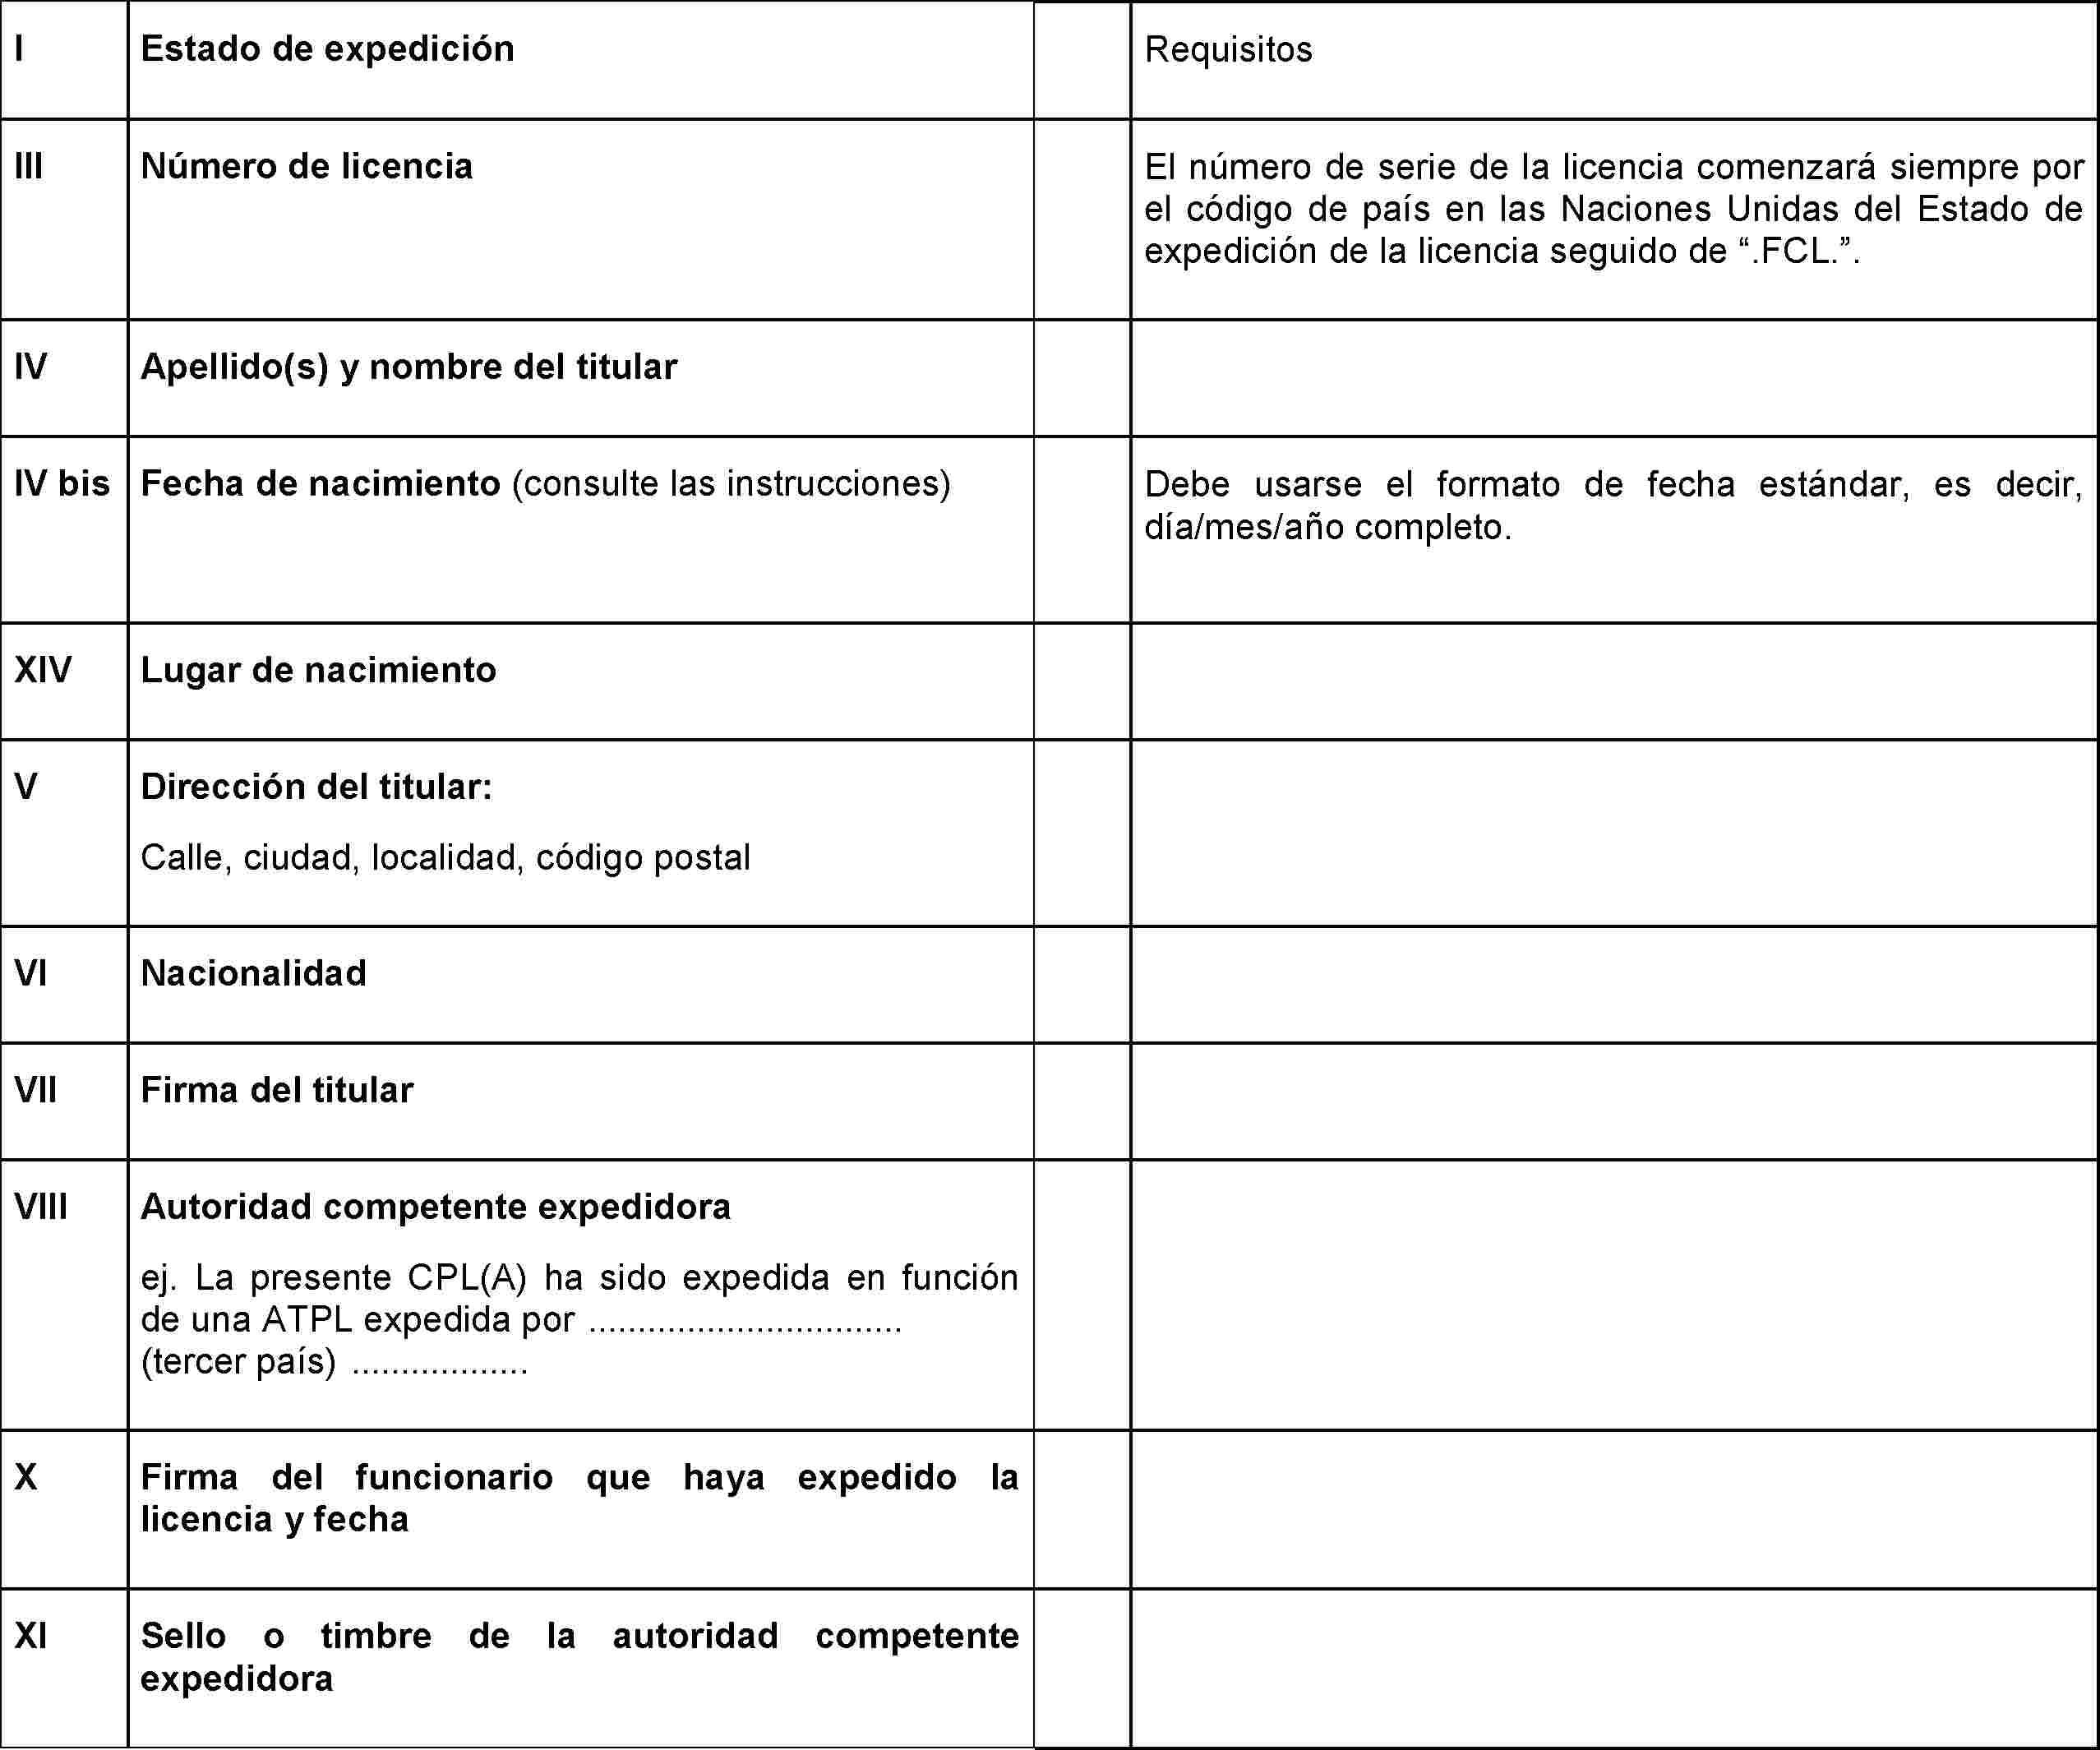 EUR-Lex - 02011R1178-20150408 - EN - EUR-Lex